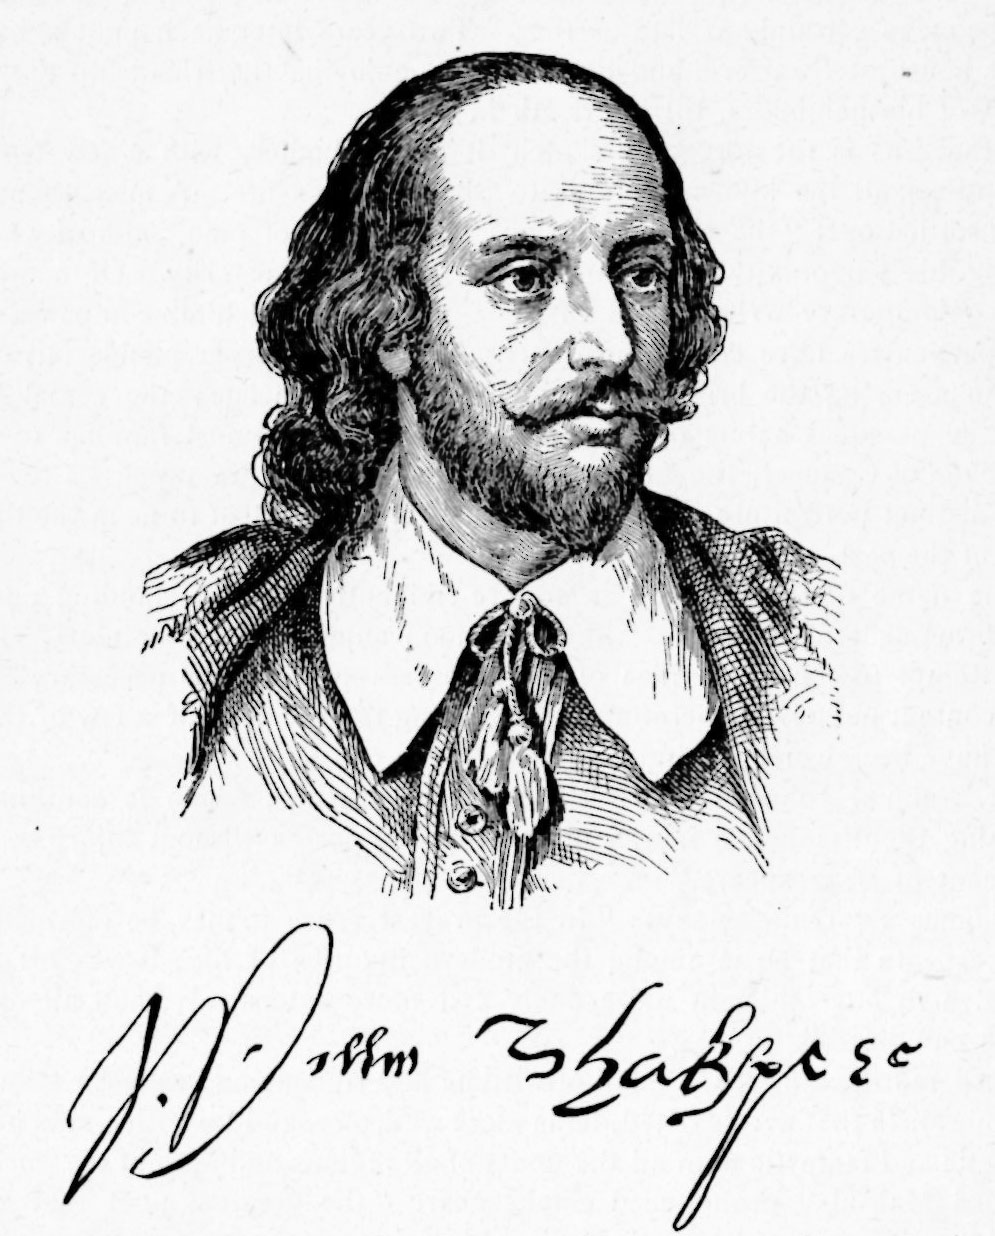 A Teacher on Teaching: Forsooth: Shakespeare Doth Explain